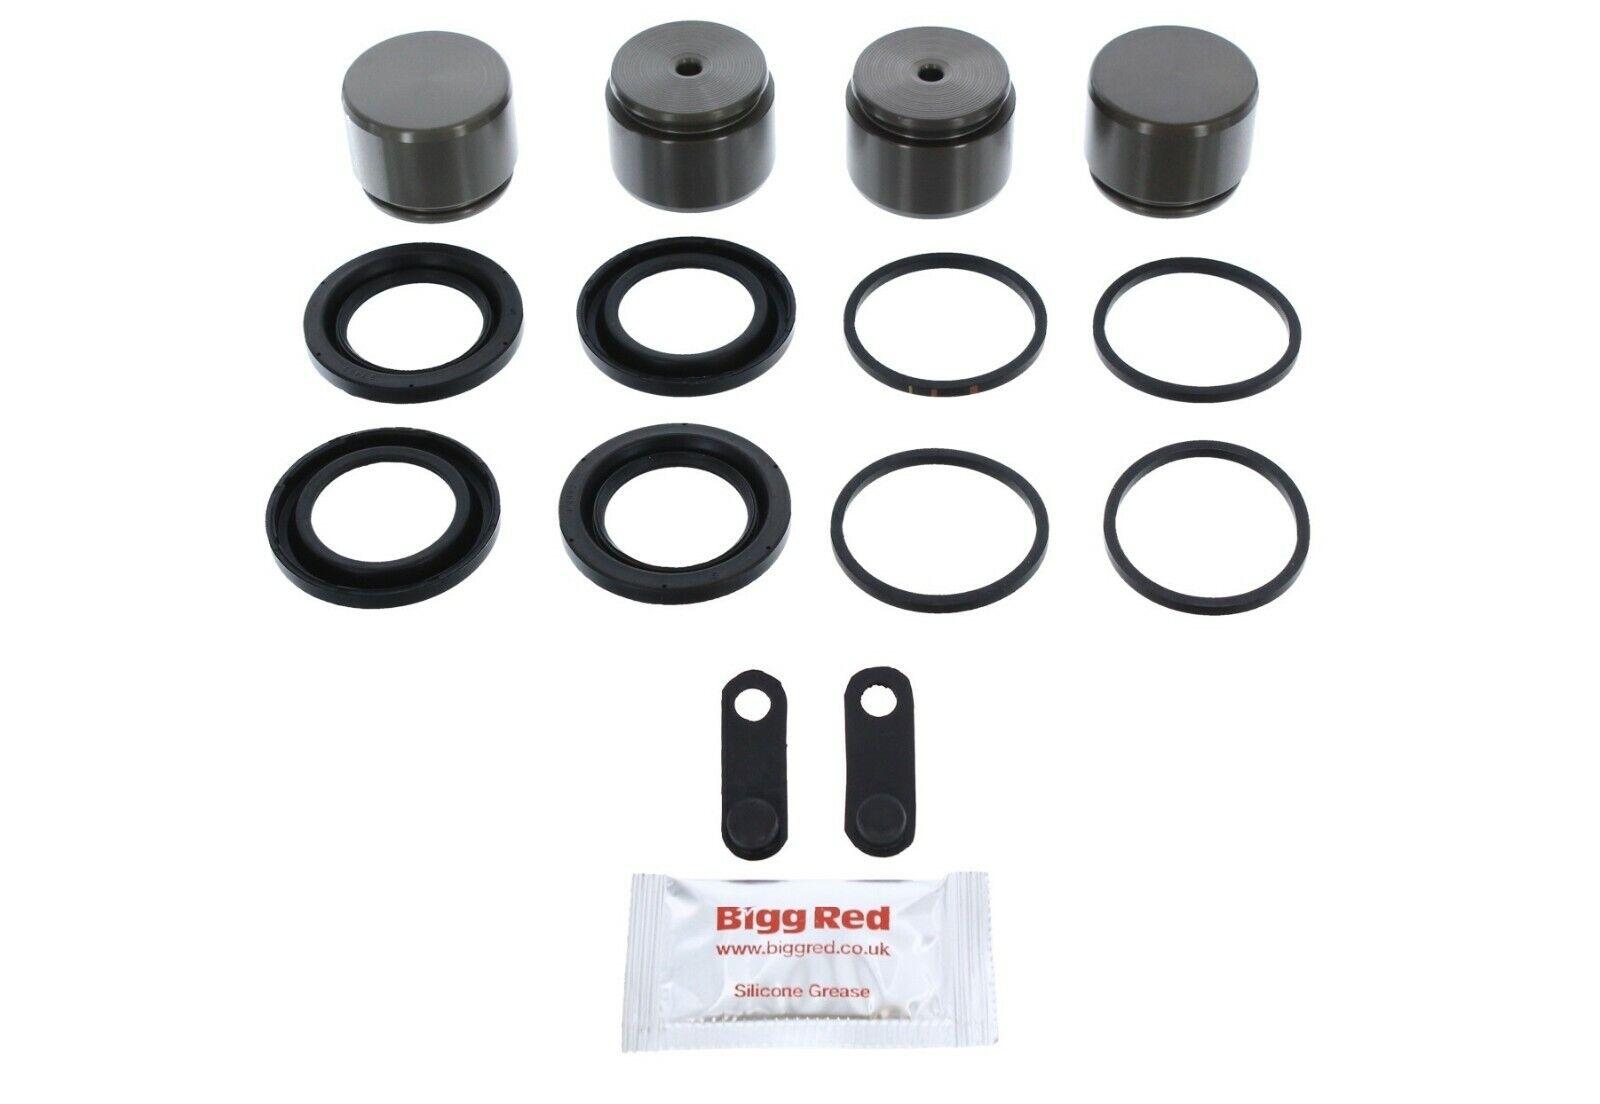 F450 2010-2012 Disc Brake Caliper Repair Kit /& pistons Ford F350 2005-2012